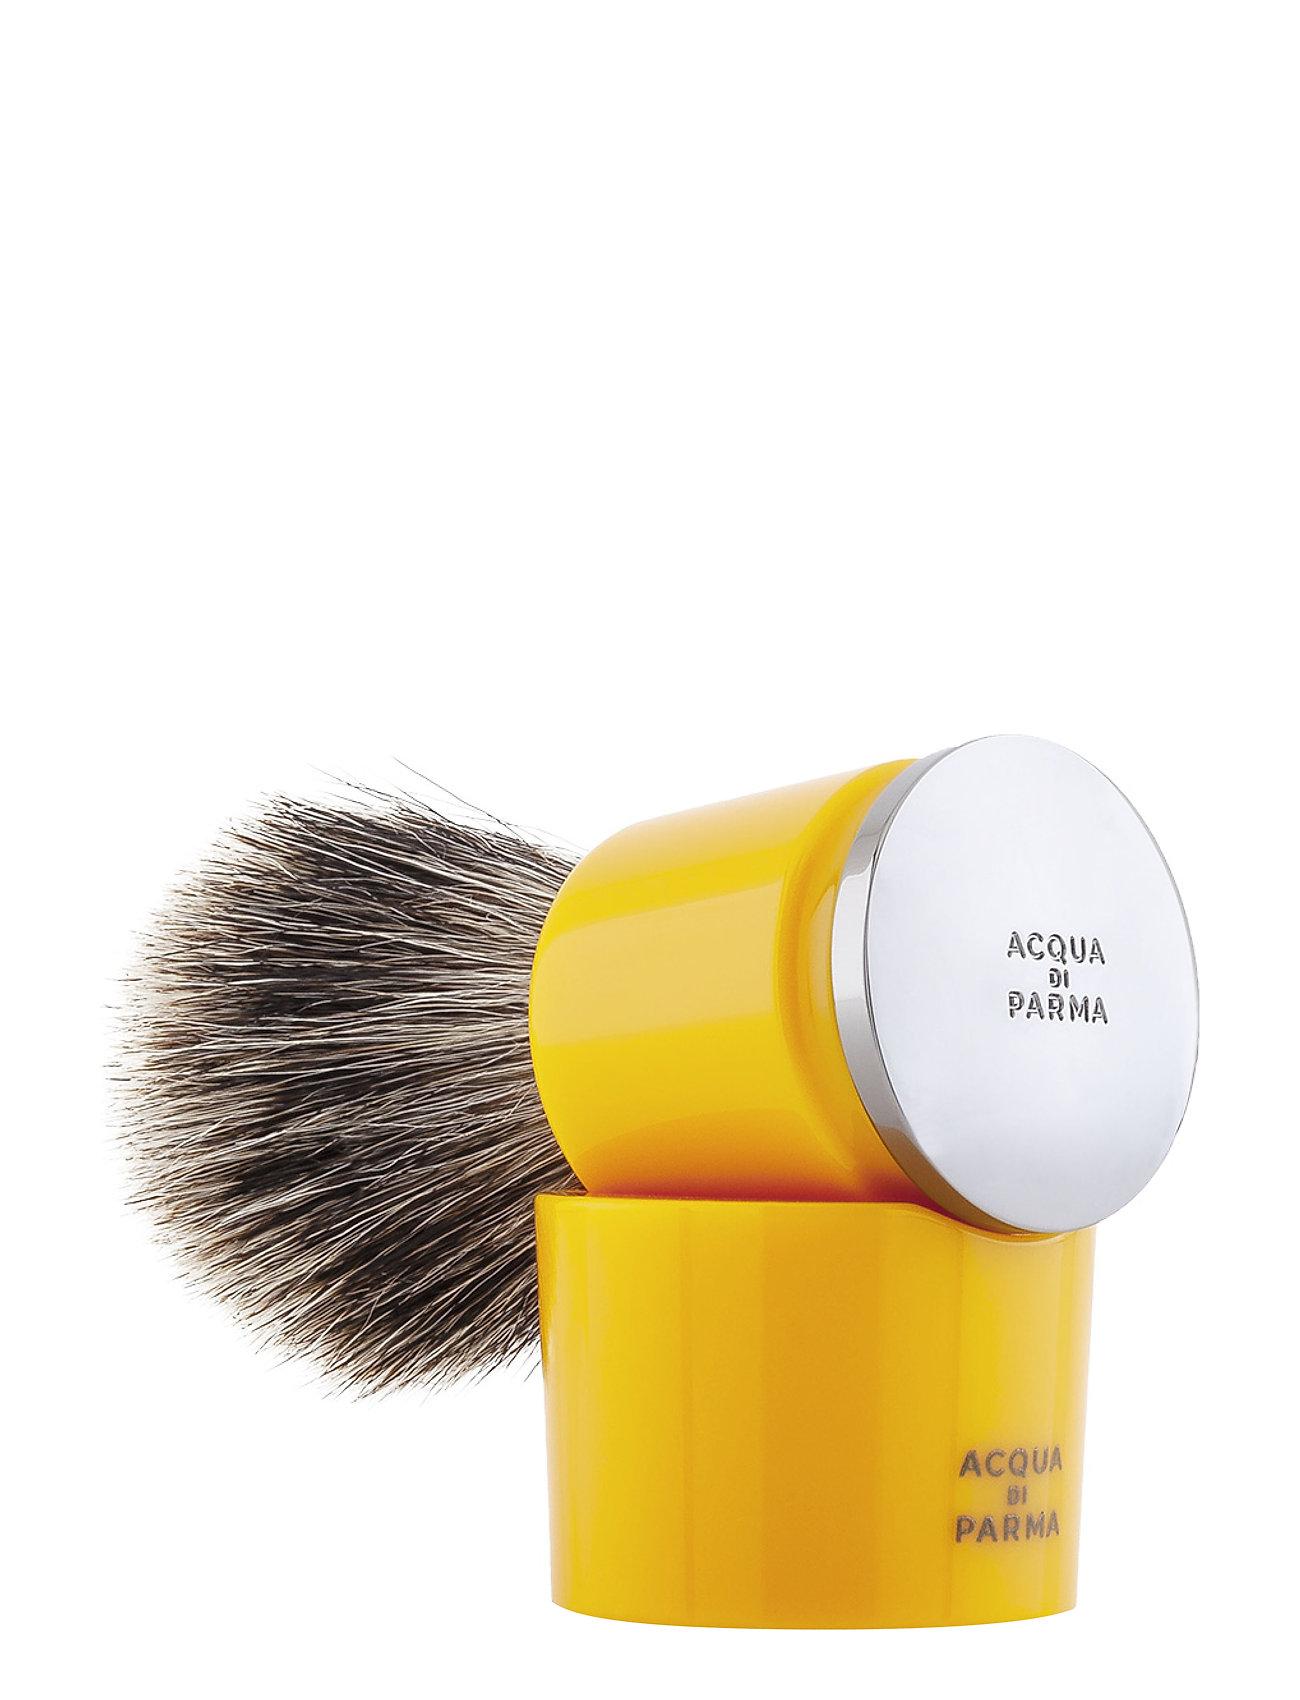 Acqua di Parma Yellow Badger Shaving Brush - CLEAR